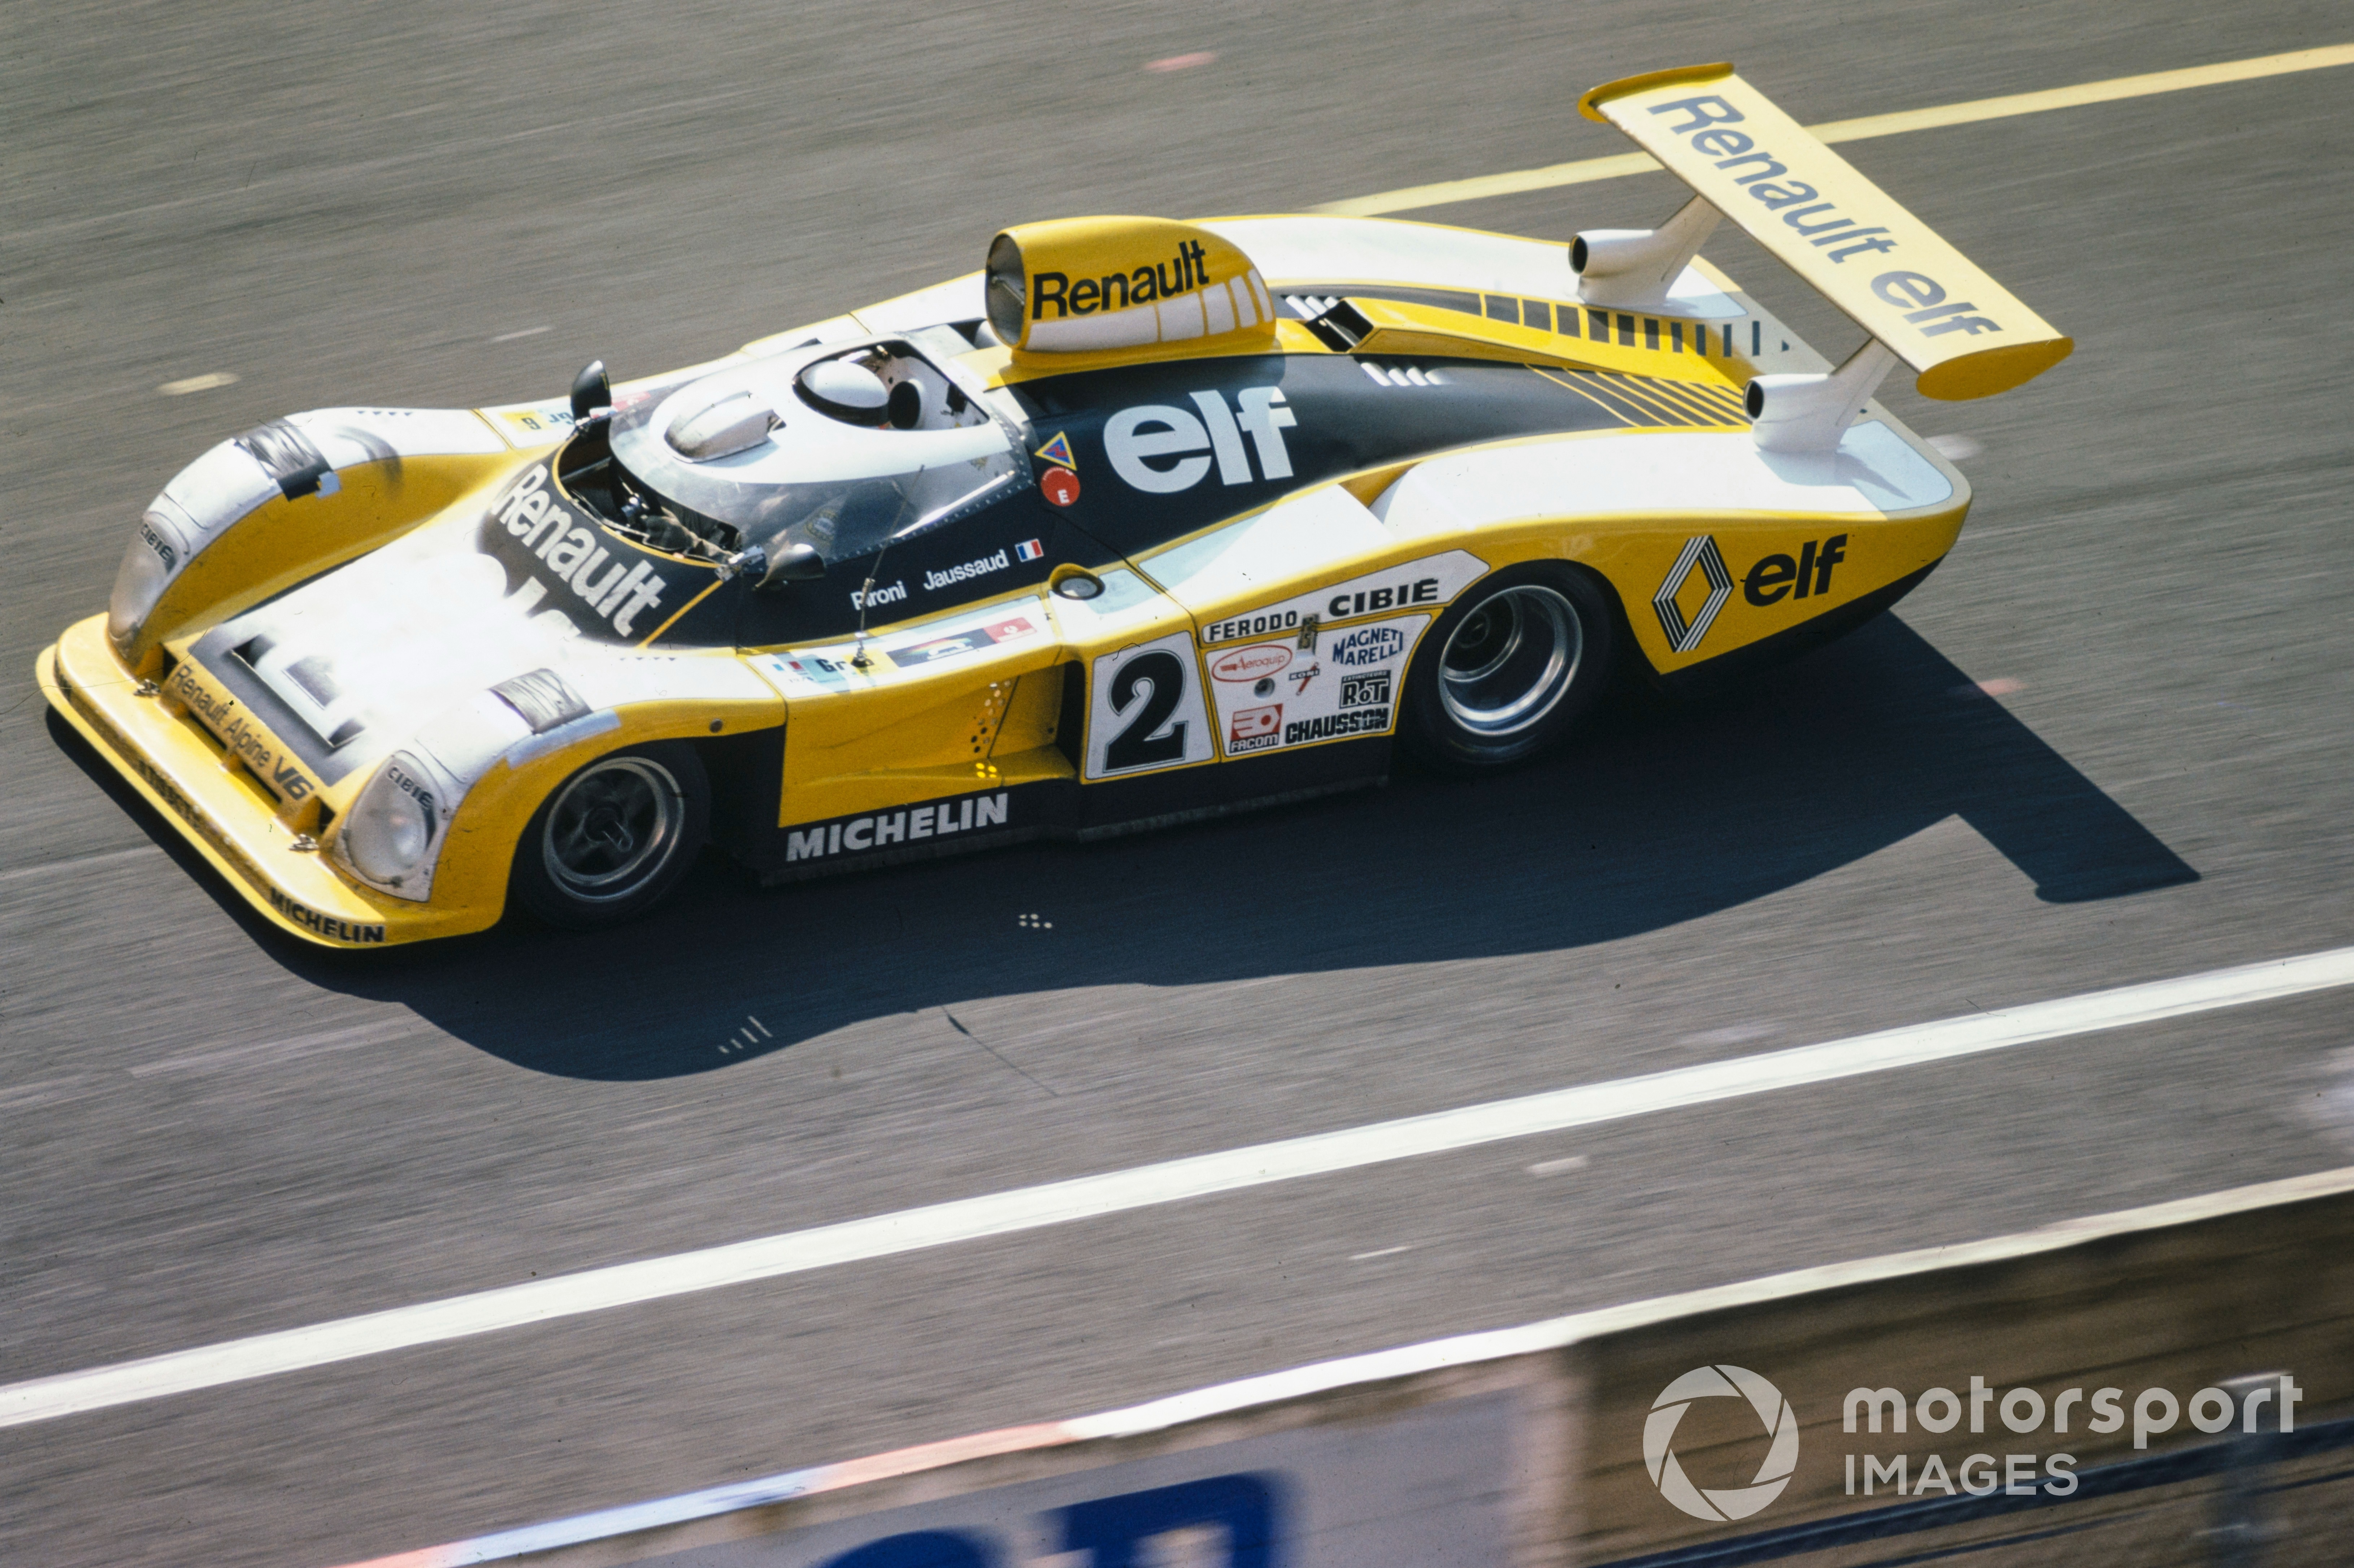 Didier Pironi / Jean-Pierre Jaussaud, Renault Sport, Renault-Alpine A442B at the 1978 Le Mans 24 Hours